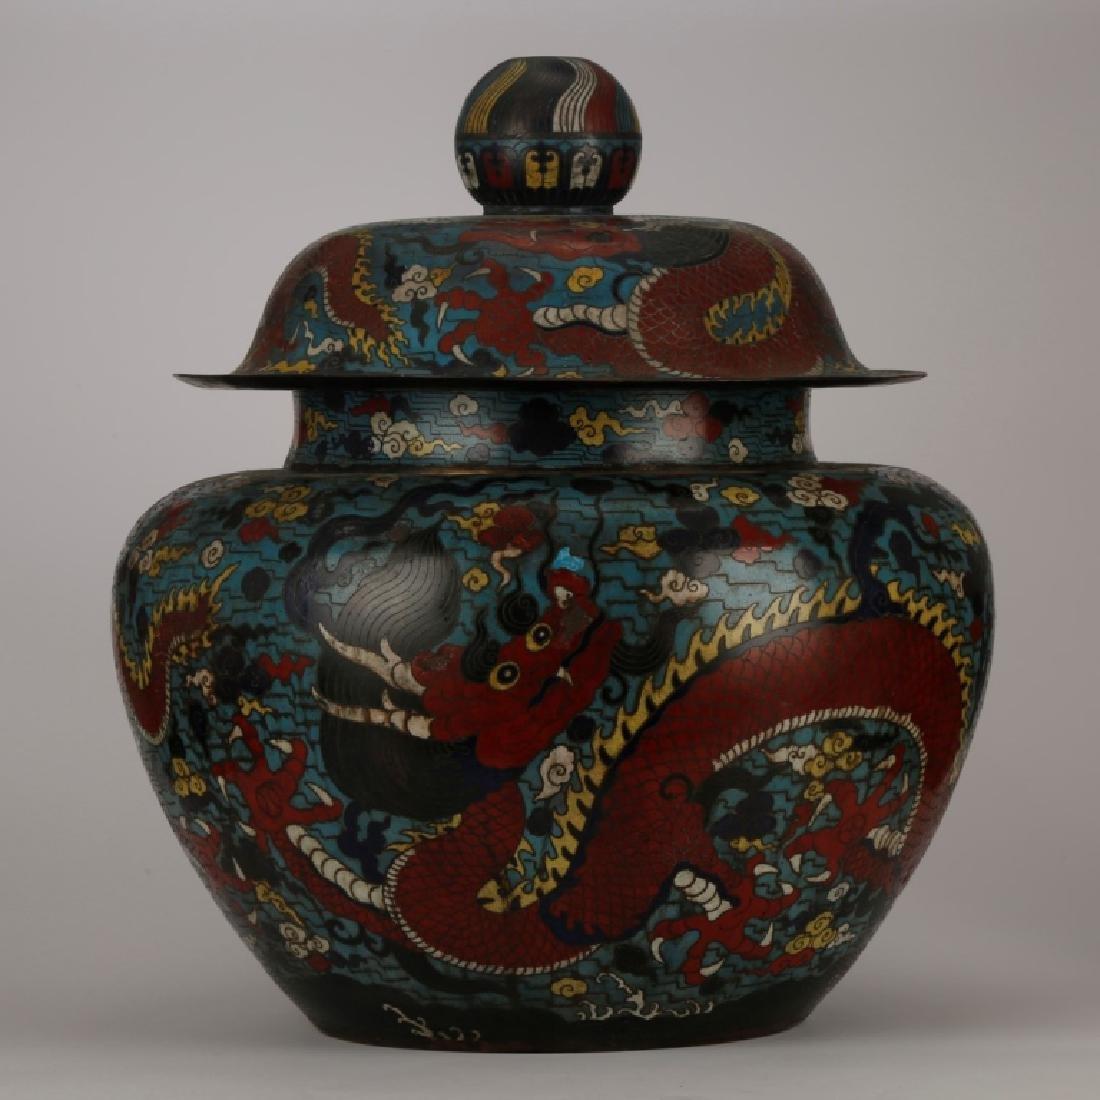 Lg Chinese Qing Cloisonne 5-Claw Dragon Jar